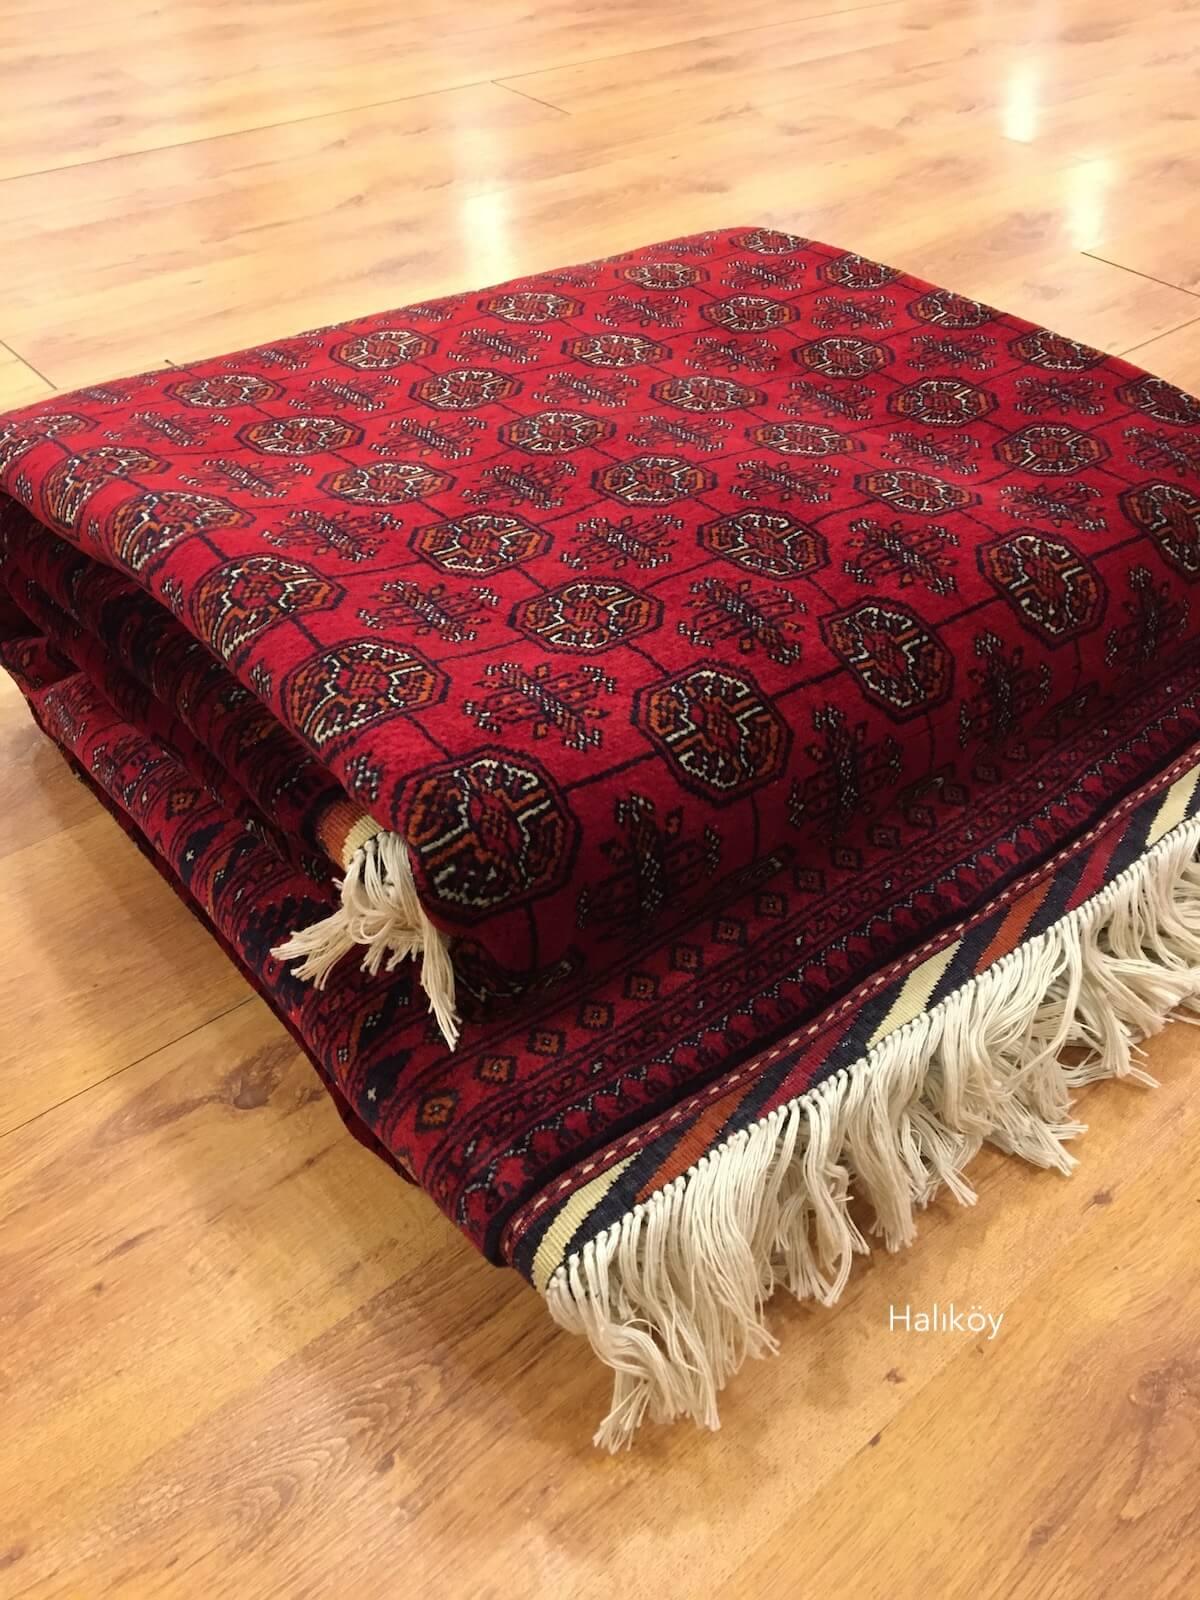 AFGAN HOCA ROSHNAİ HALISI 247X346 Hoca Roshnai Afgan Halı